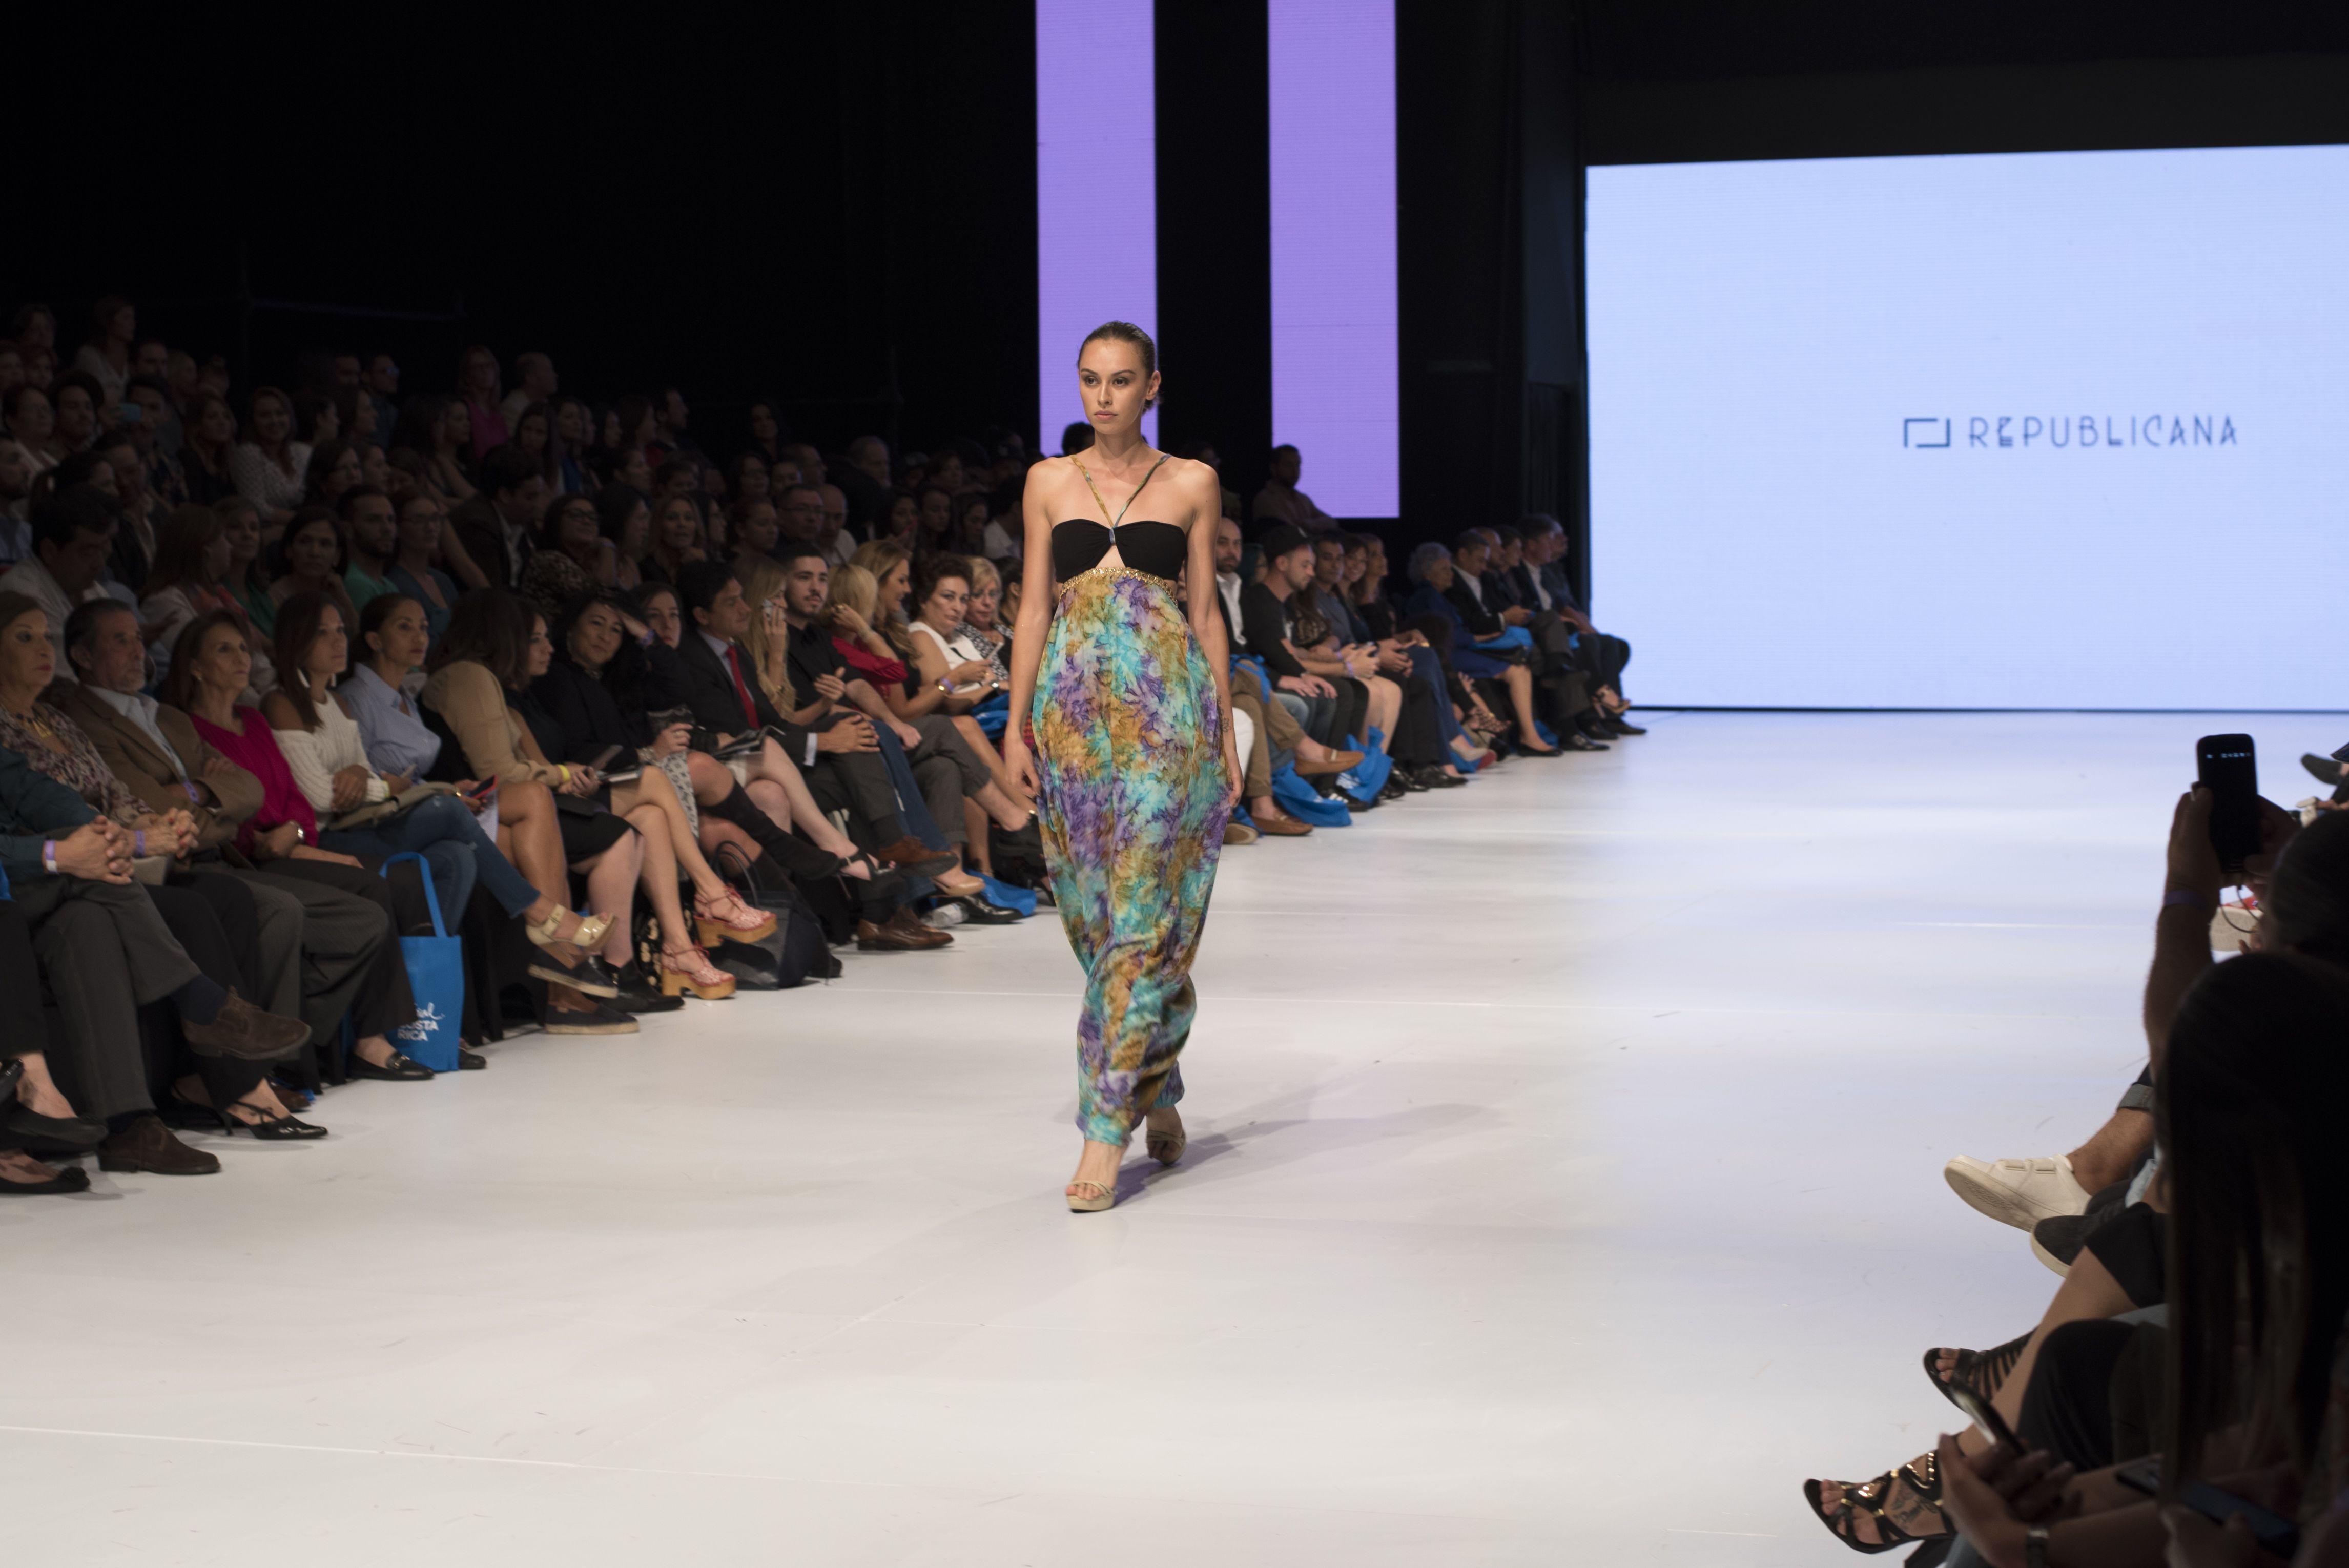 Republicana At The Mercedes Benz Fashion Week San Jose 2016 Mercedes Benz Fashion Week Fashion Resort Wear